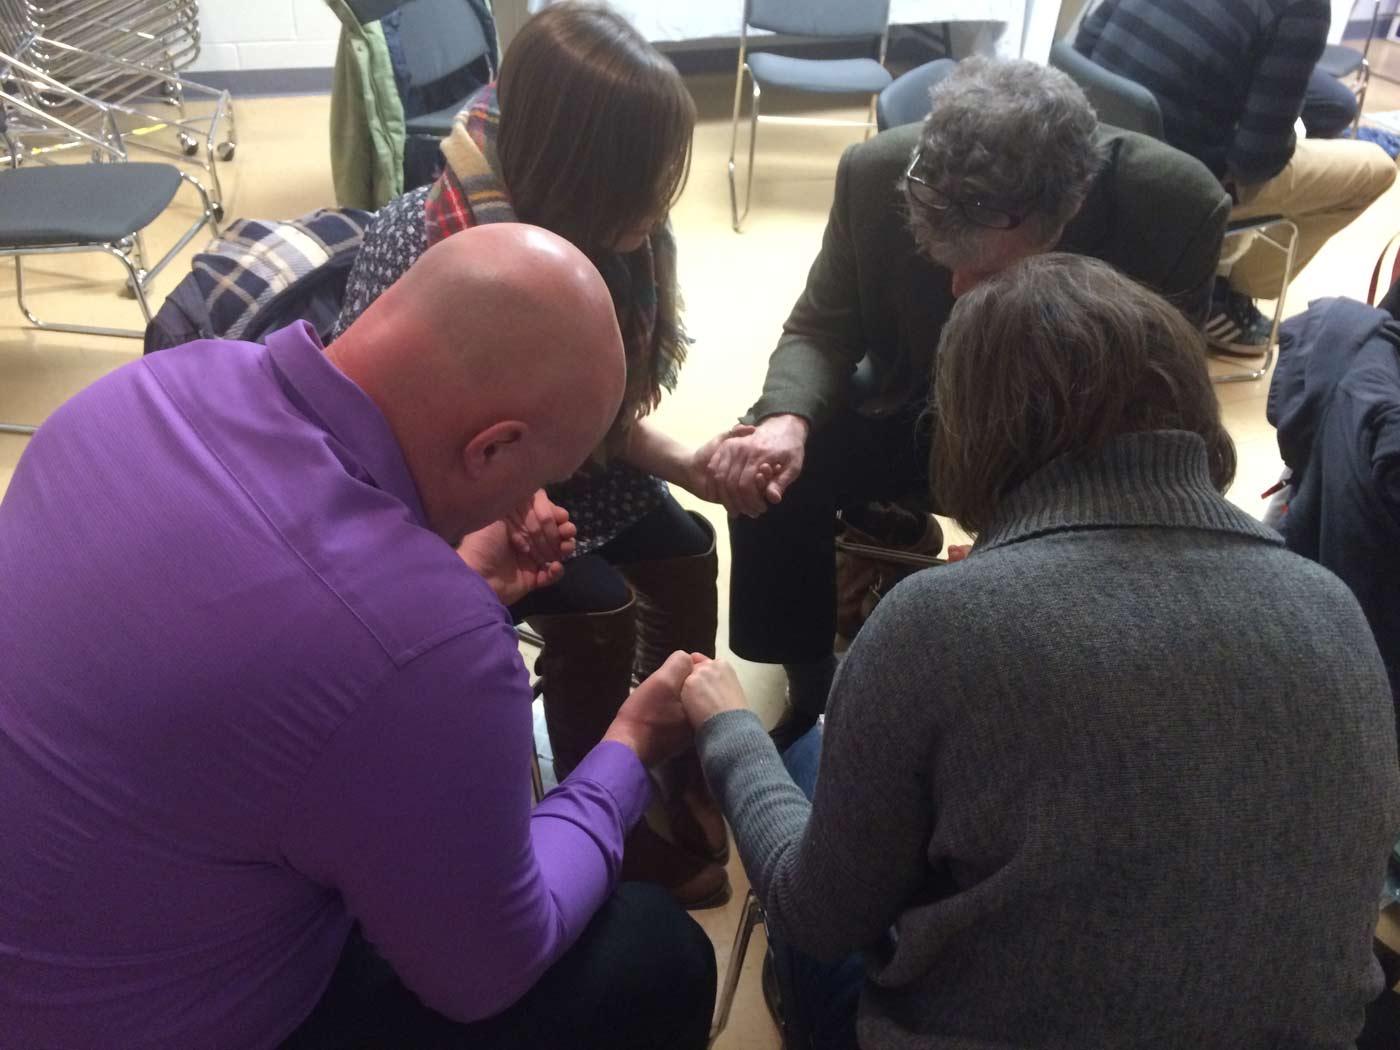 PC-group-hands-prayer.jpg